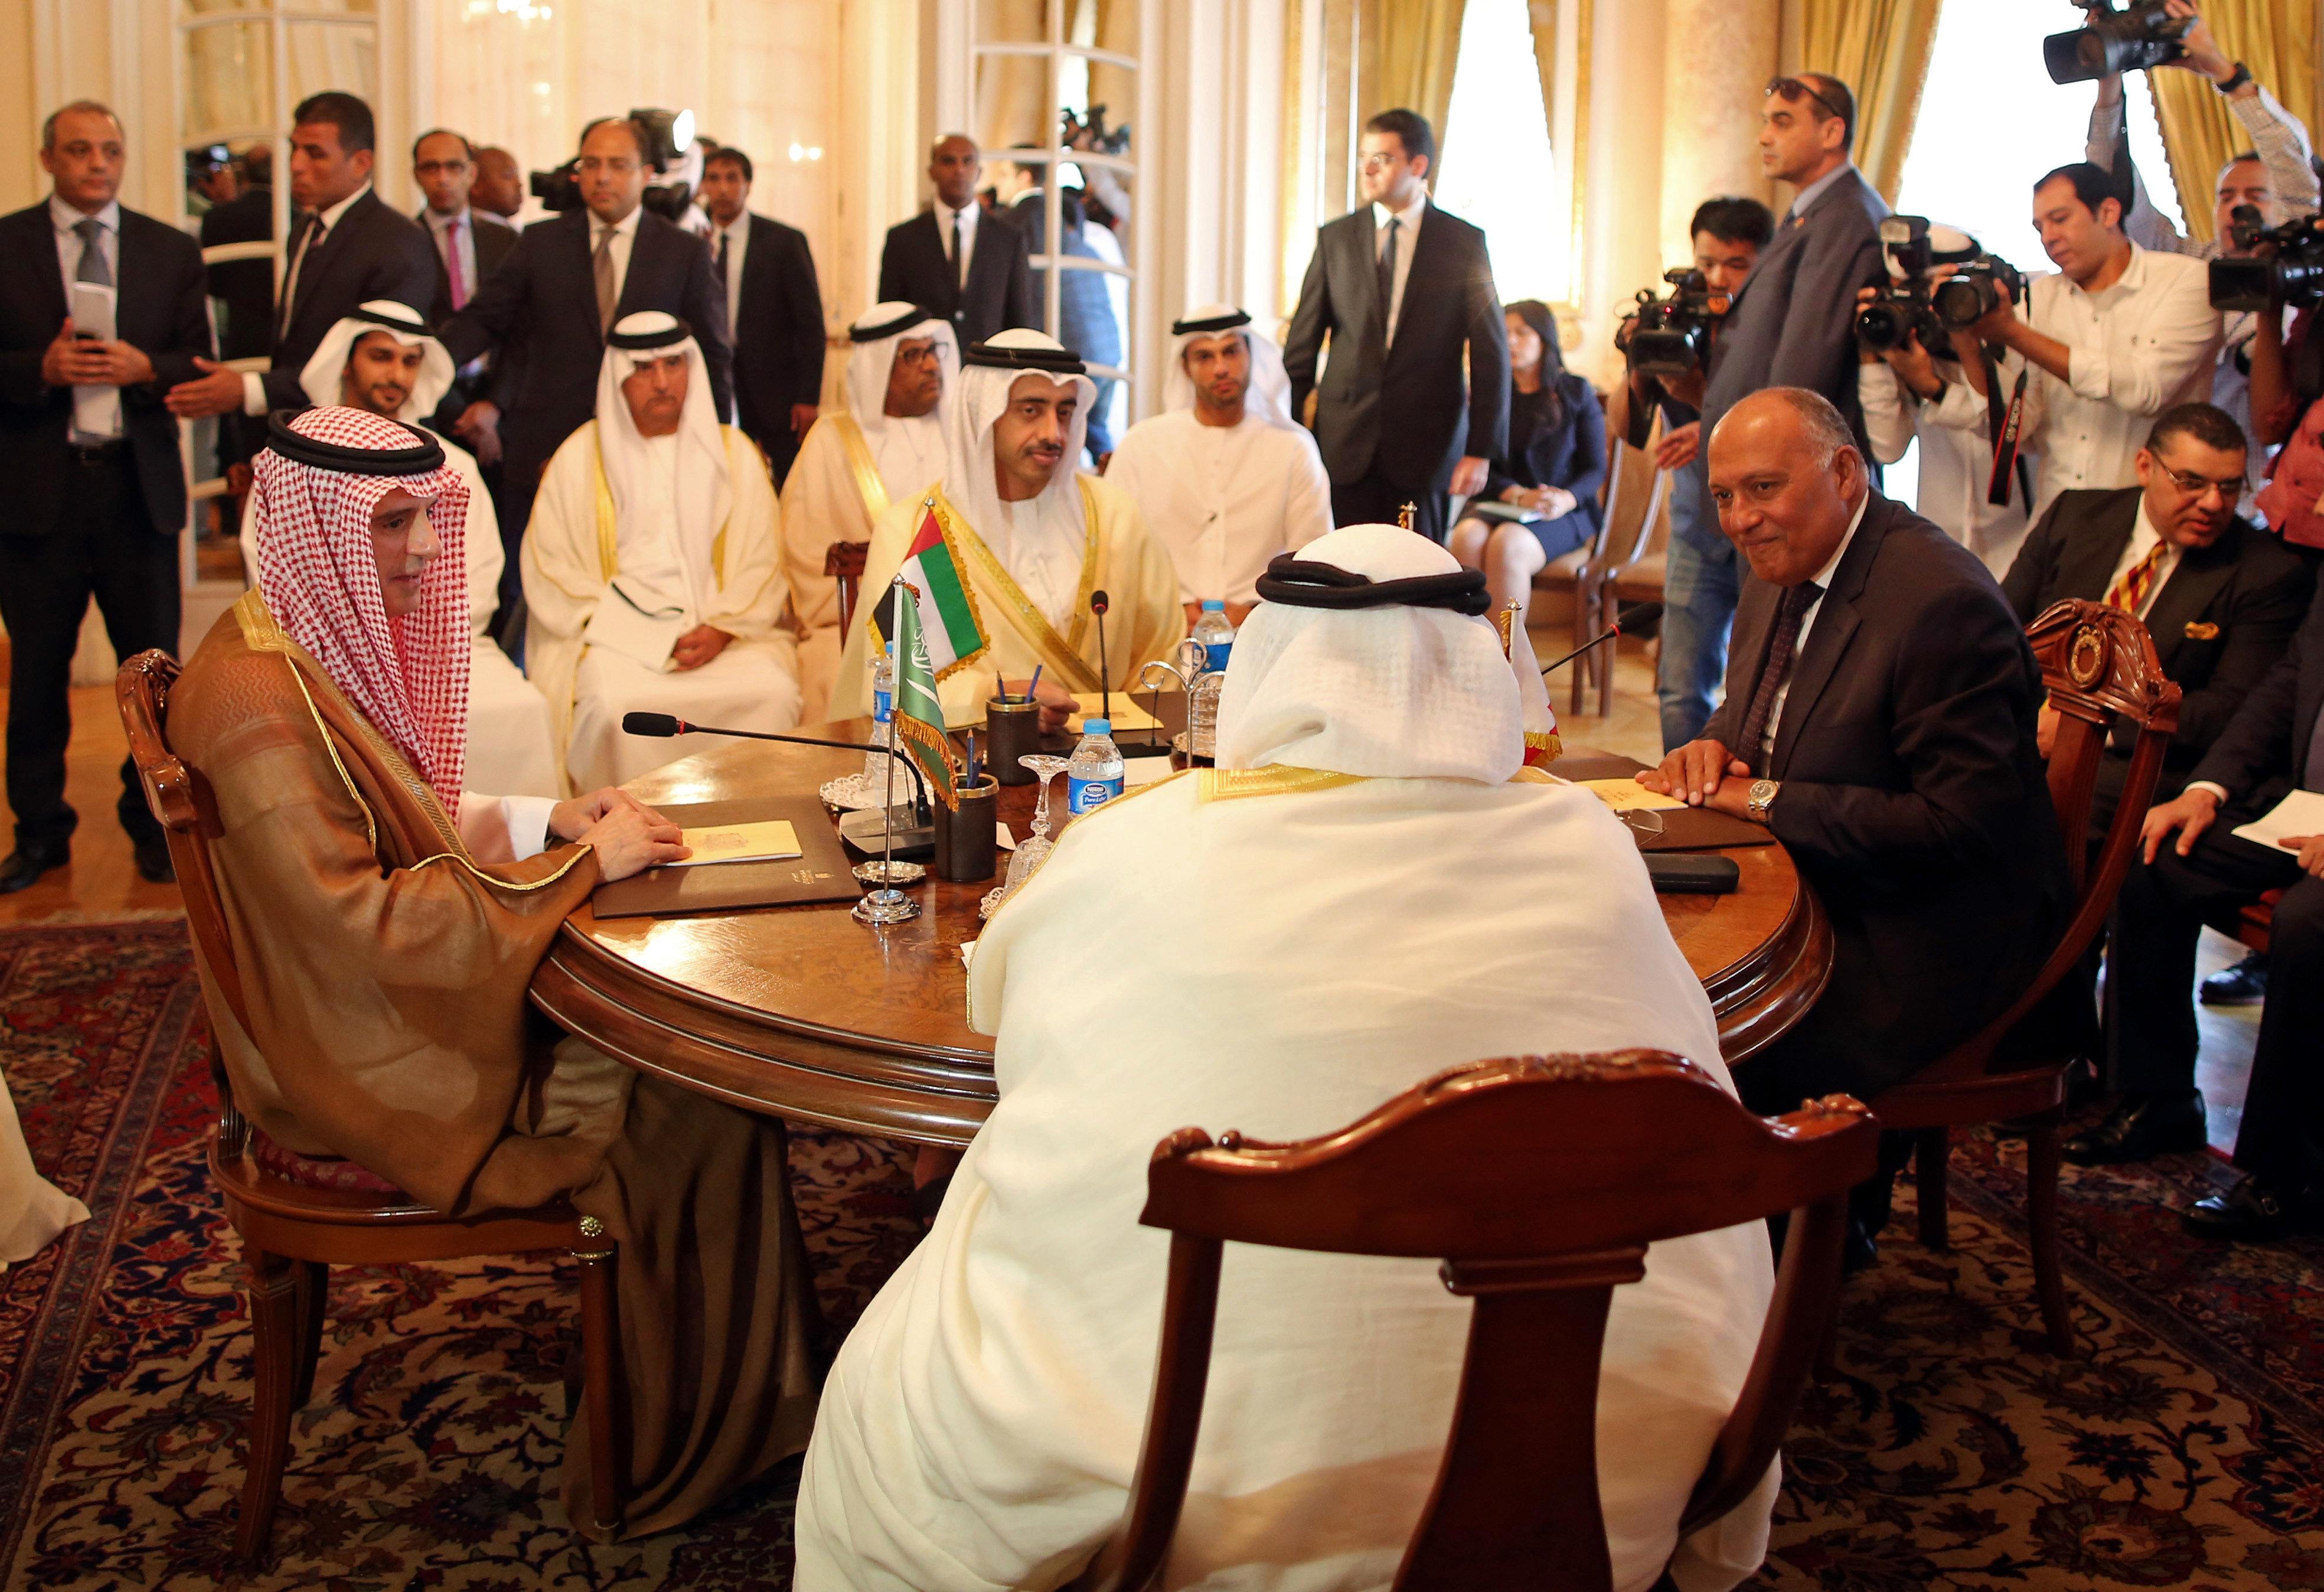 Existing Agreements and U.S. Leadership Emerge as Keys to Resolving Qatar Standoff